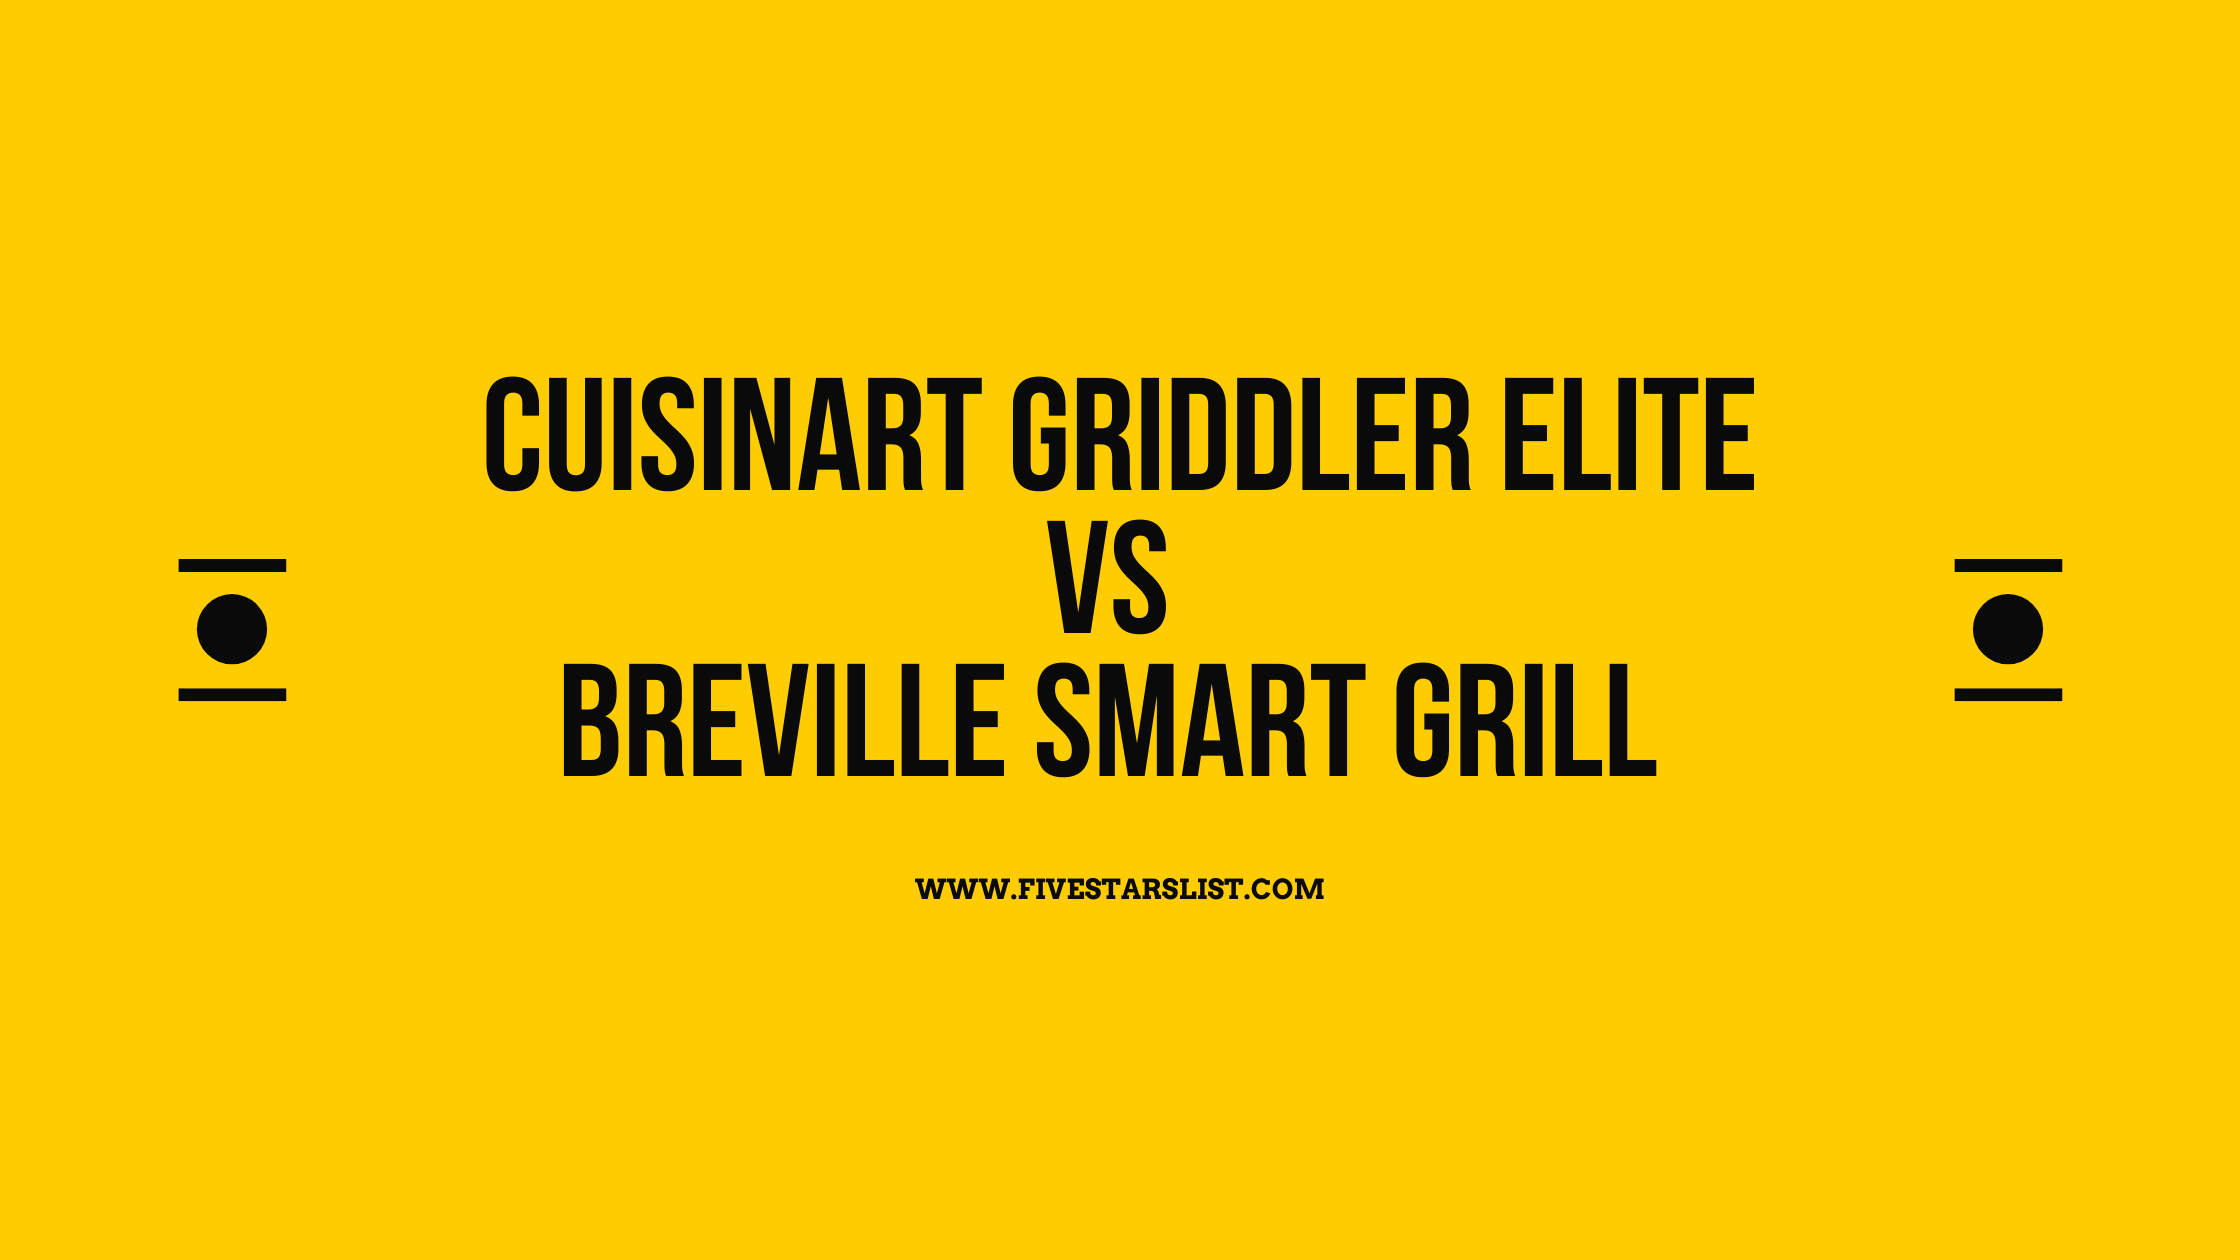 Cuisinart Griddler Elite vs Breville Smart Grill